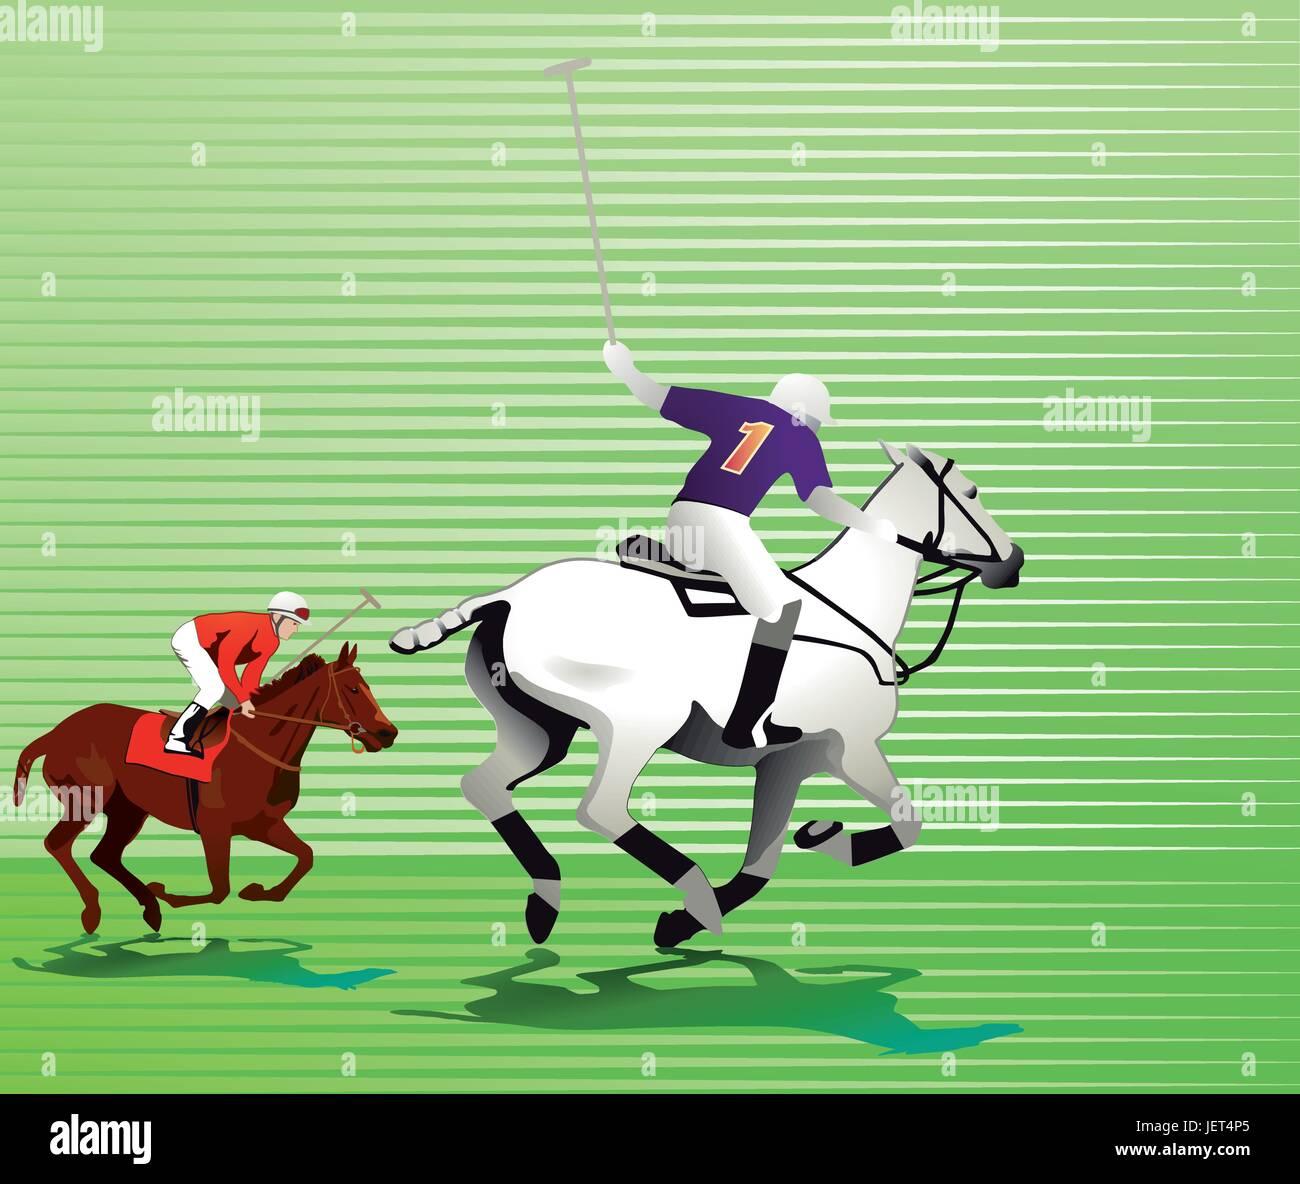 cavalry, horse, horses, gallop, mare, winner, bridle, rider, equestrian, polo, - Stock Vector